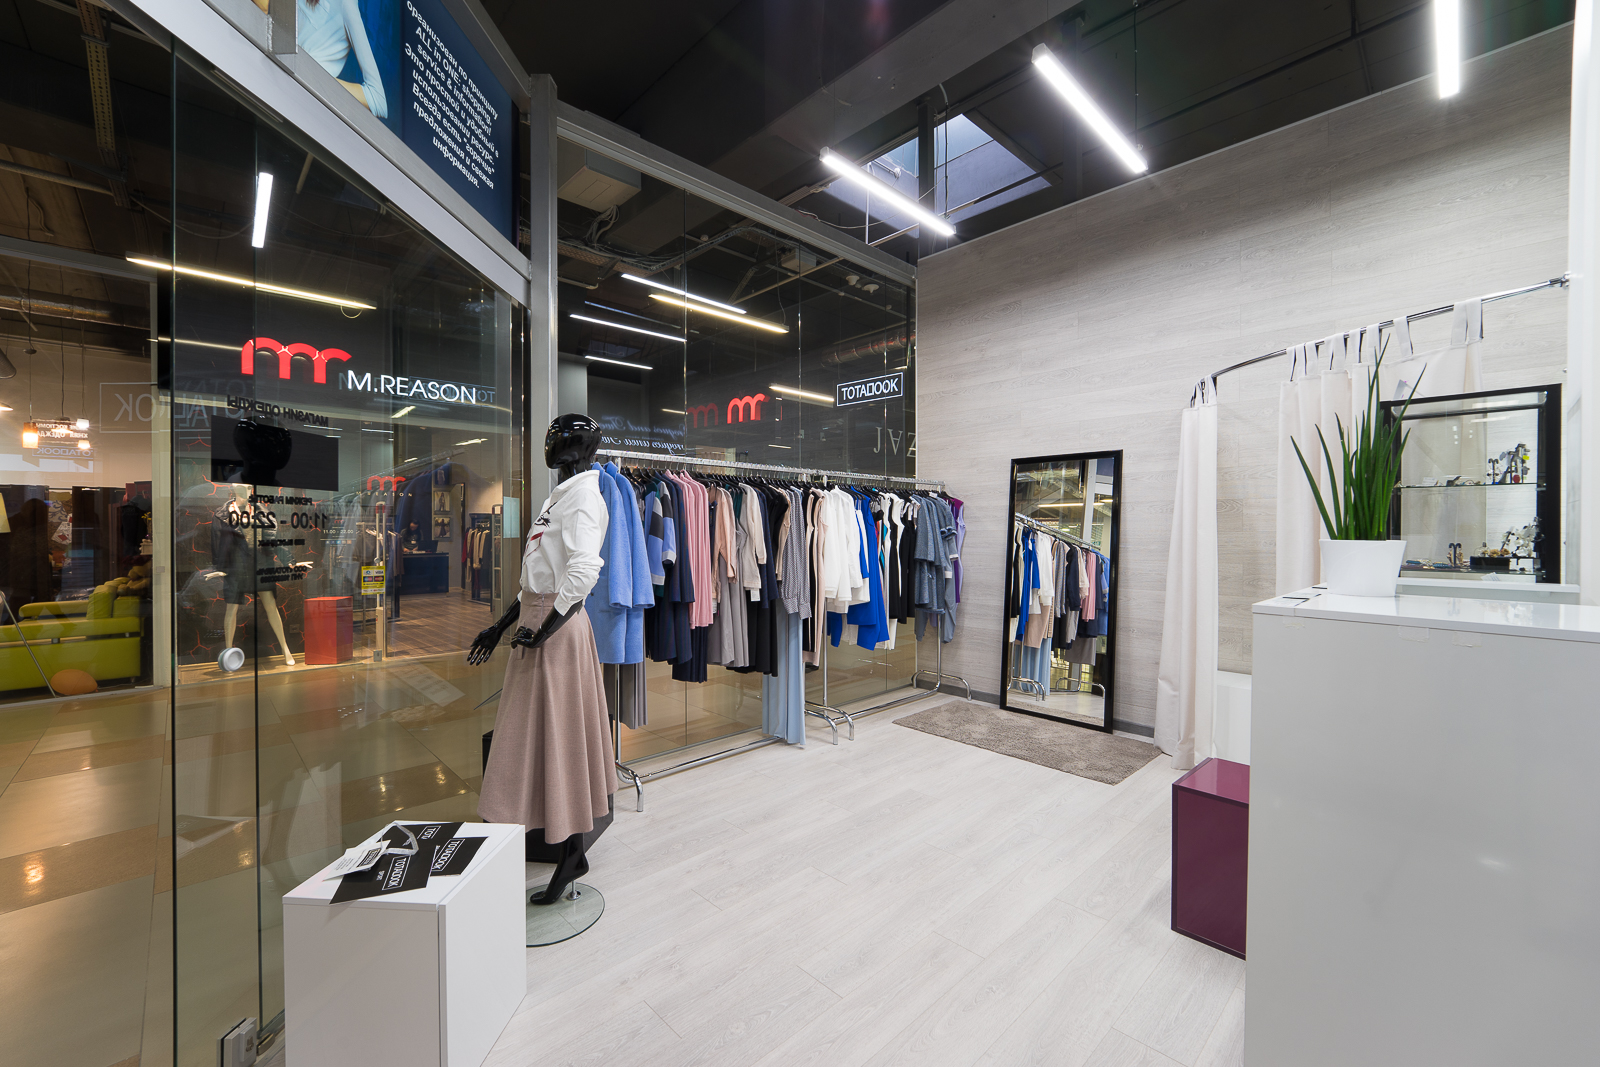 FASHION MARKET (SIROCCO ) Cyprus Business Directory Sirocco fashion market larnaca